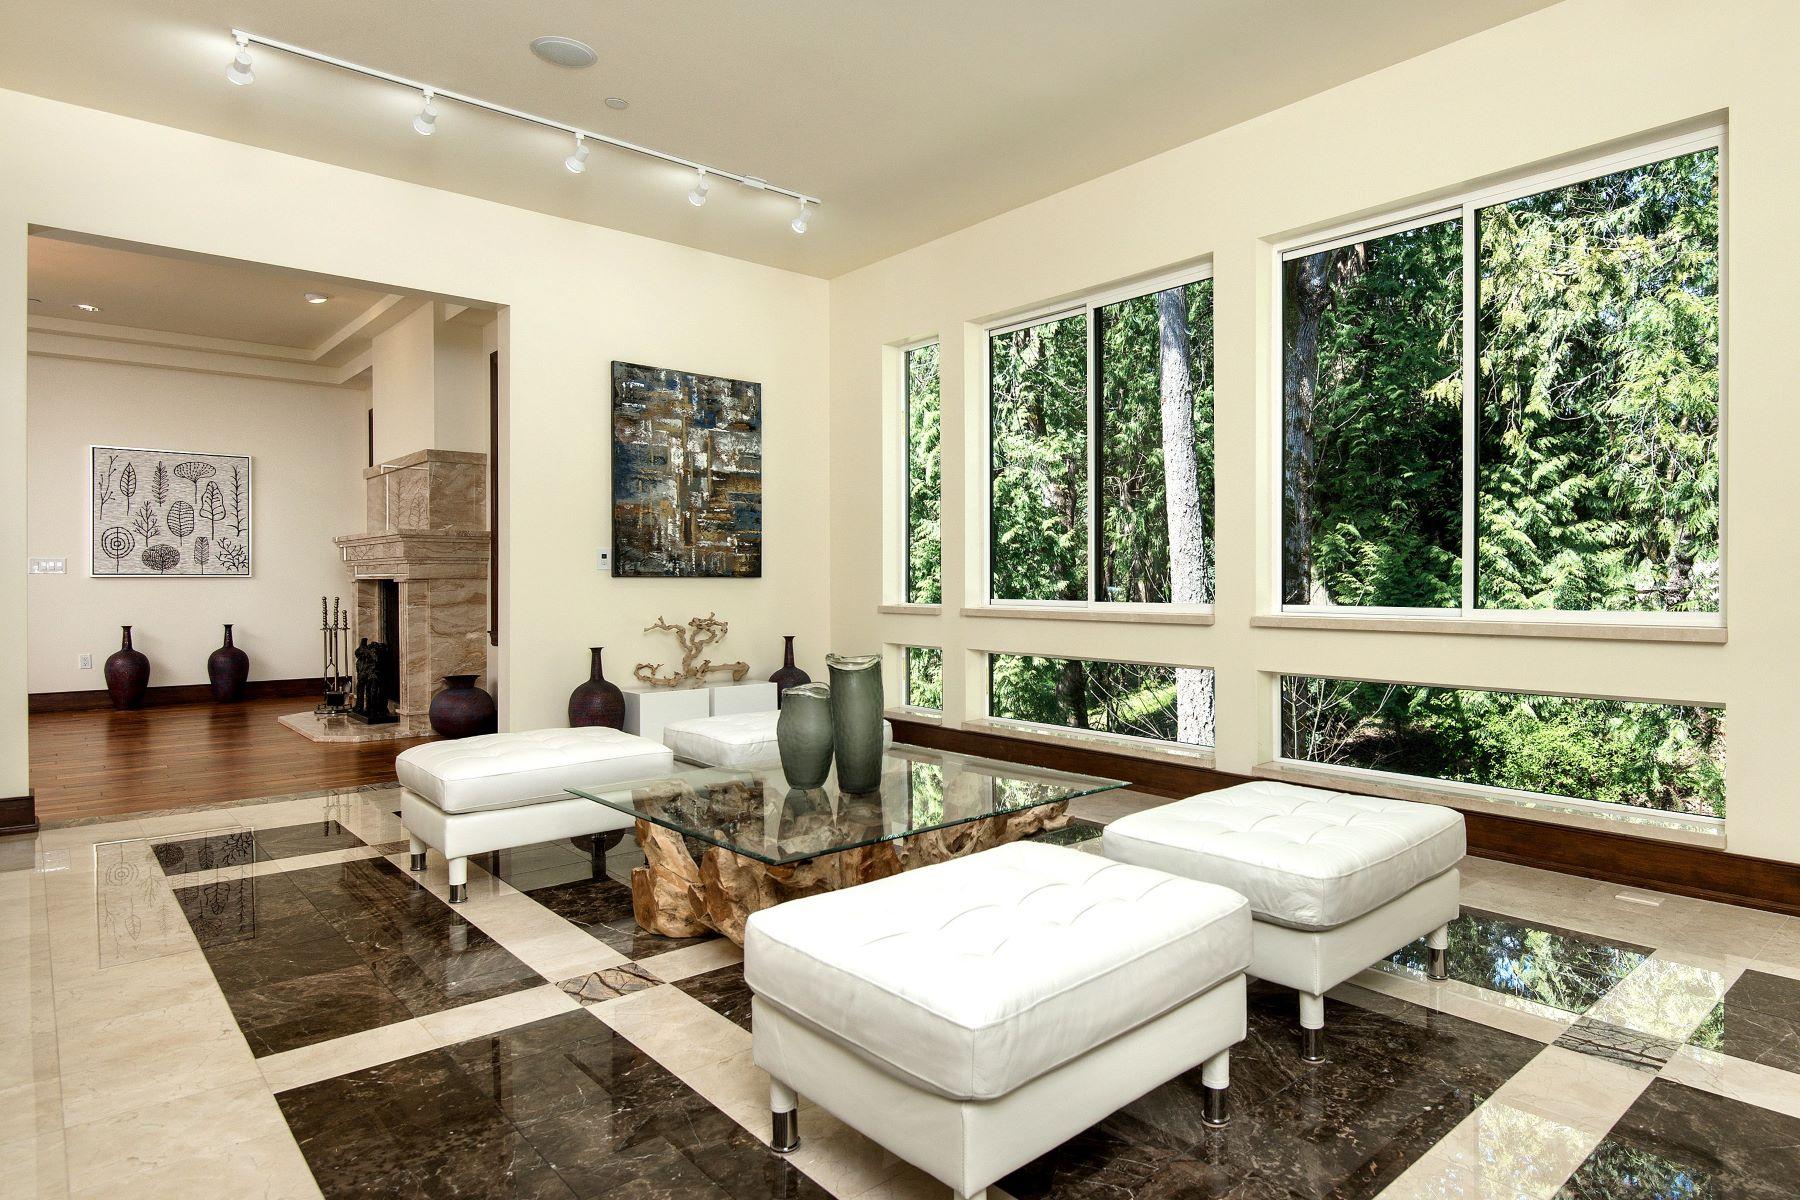 Additional photo for property listing at Sammamish Chateau 4121 198th Ct Ne Sammamish, Washington 98074 United States